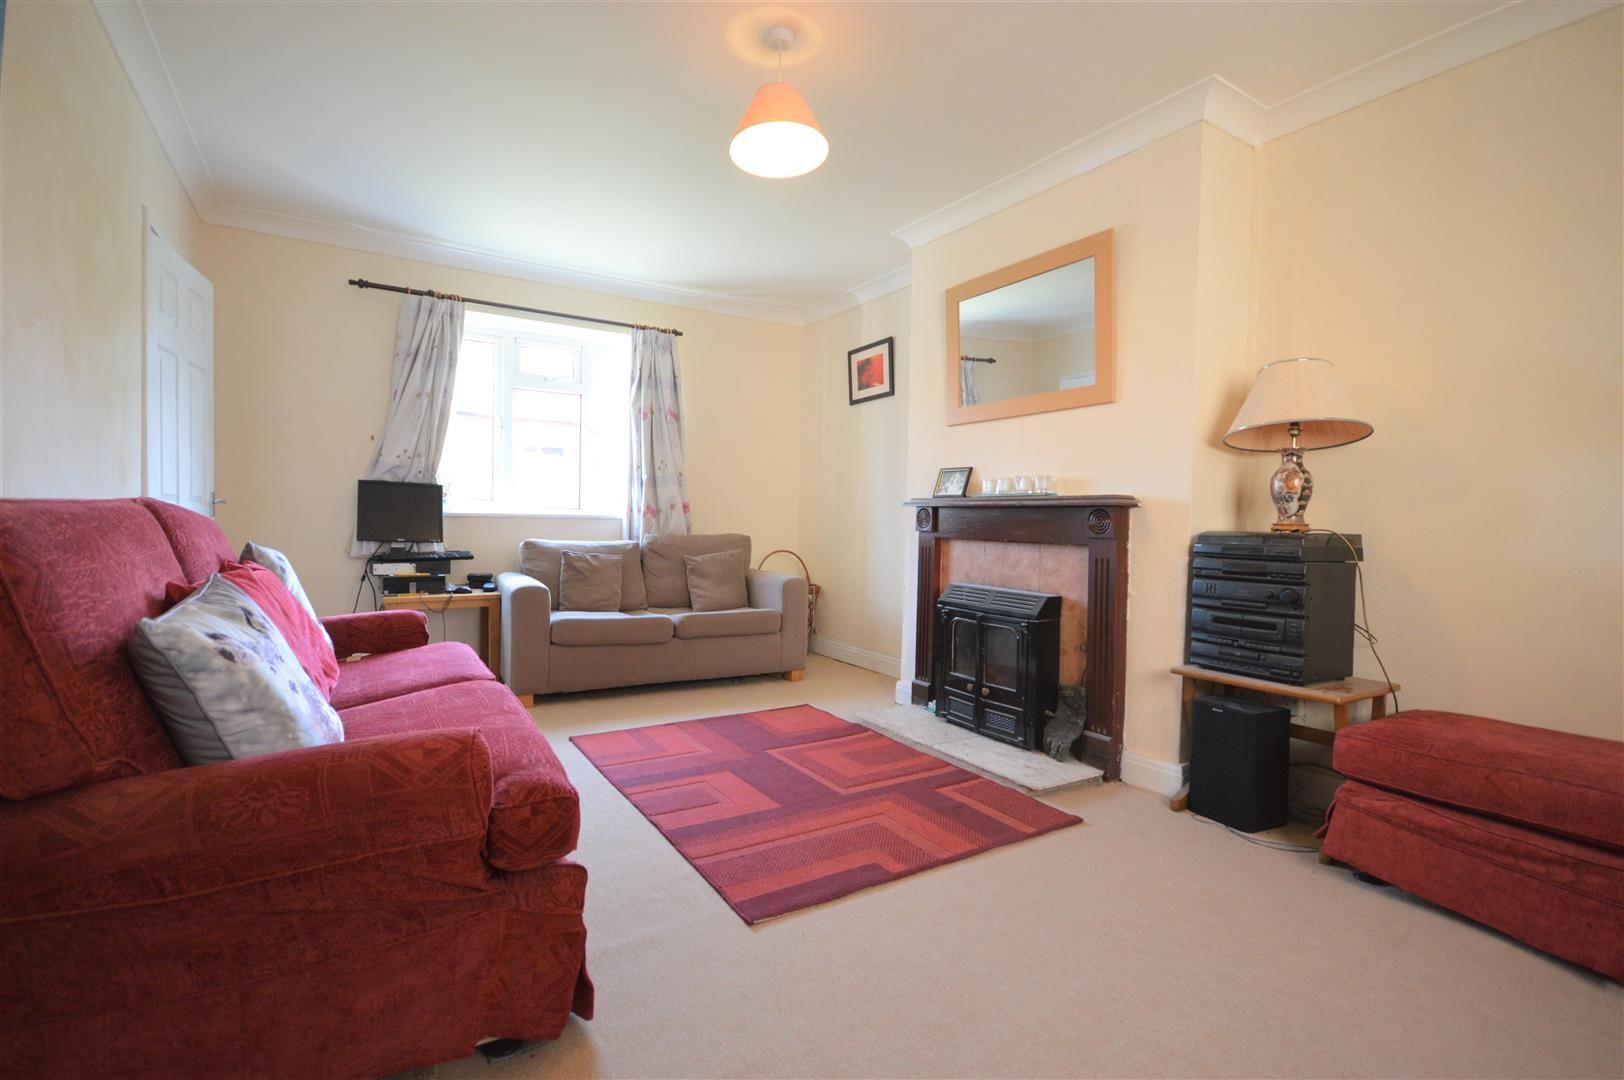 4 bed semi-detached for sale in Presteigne  - Property Image 2